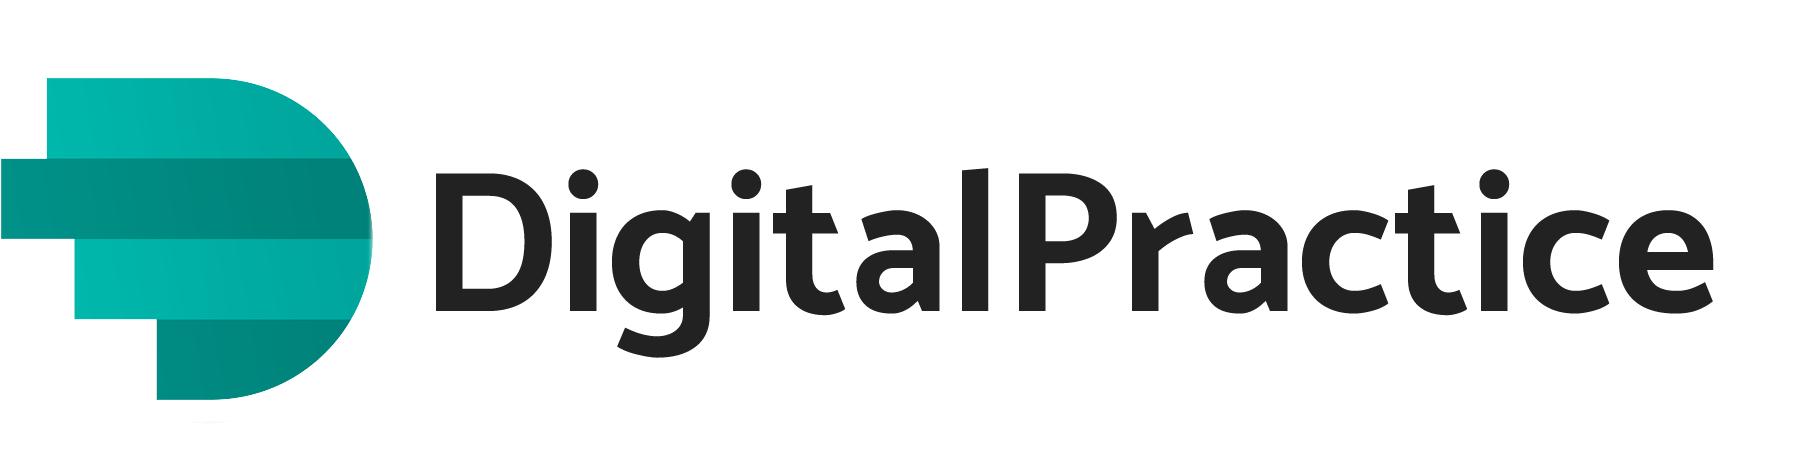 DigitalPractice